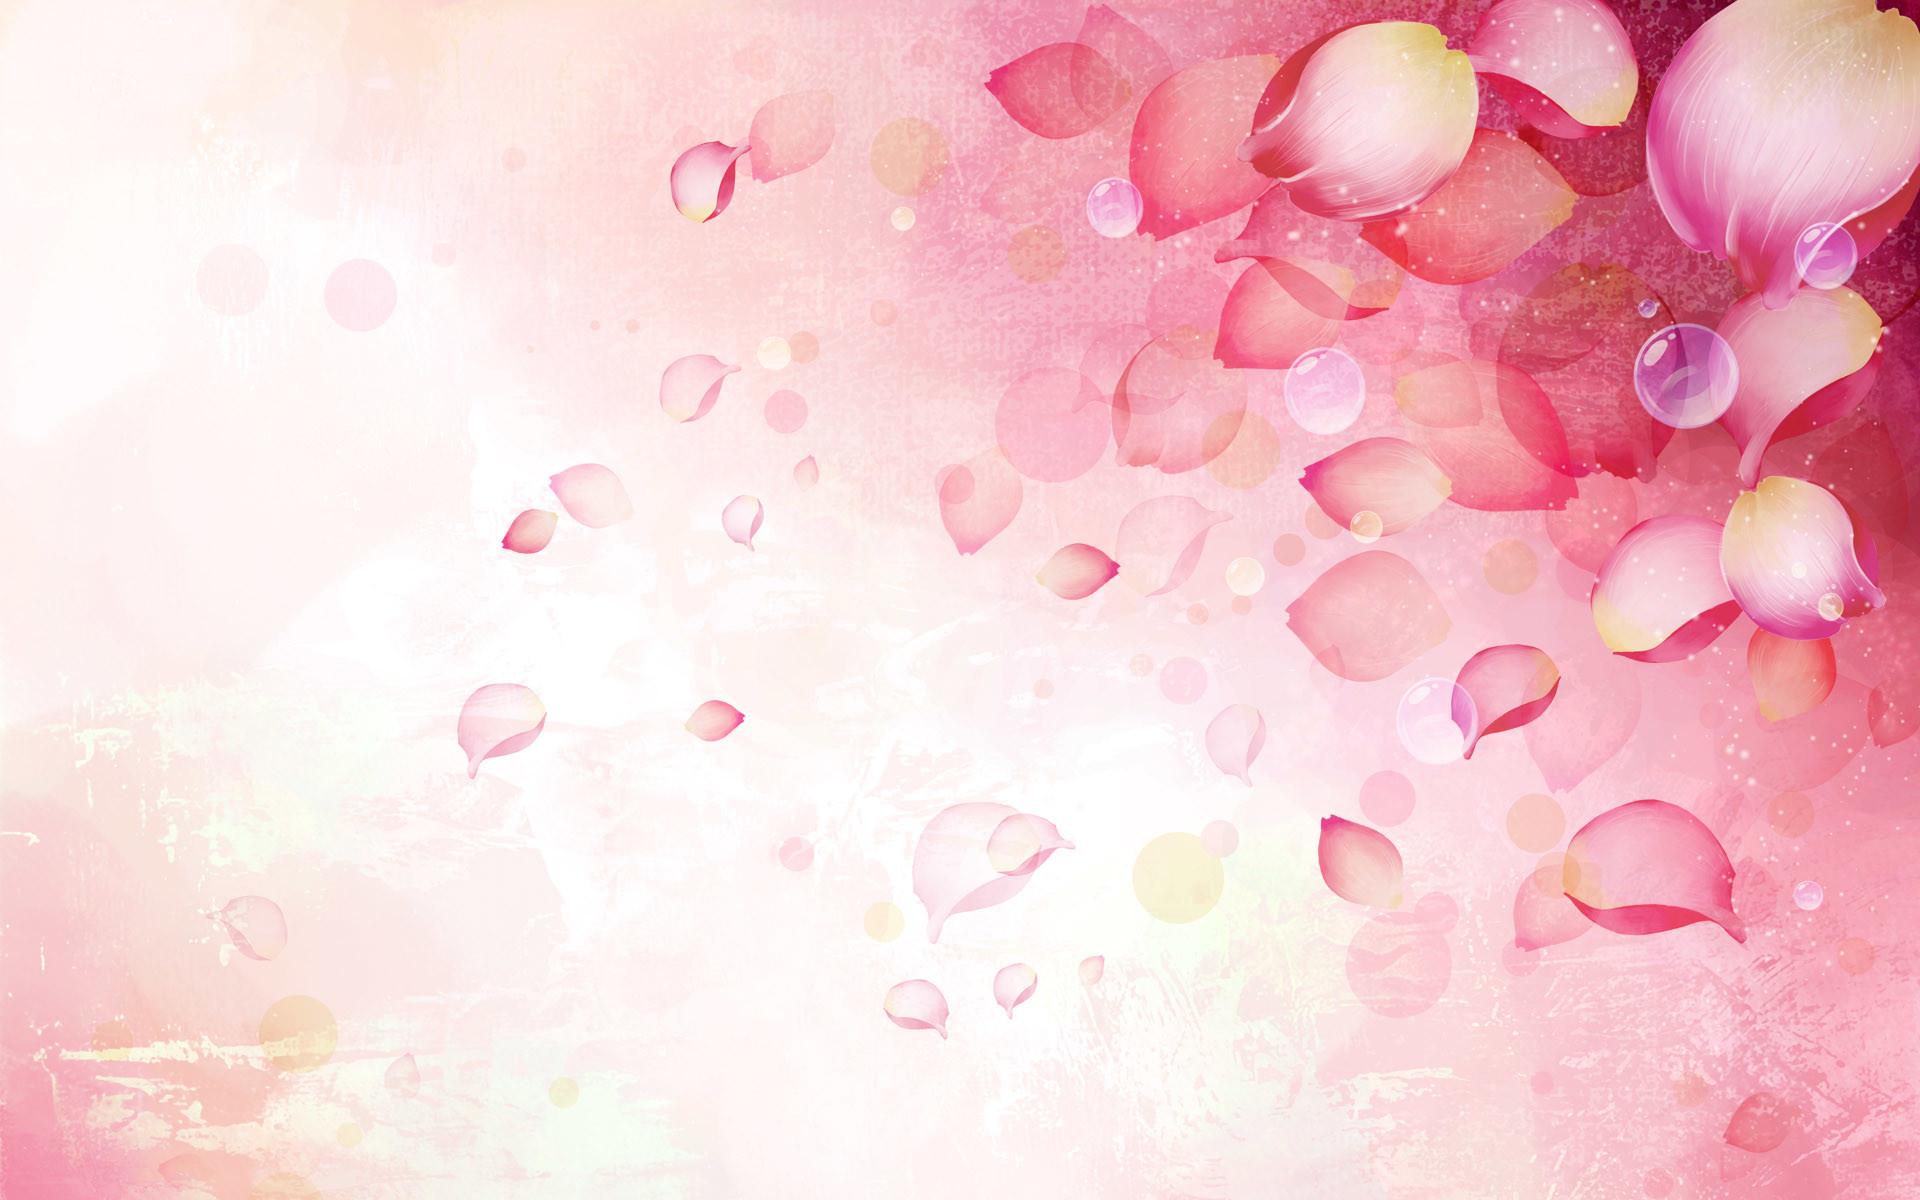 Pink background image romantic mightylinksfo Gallery